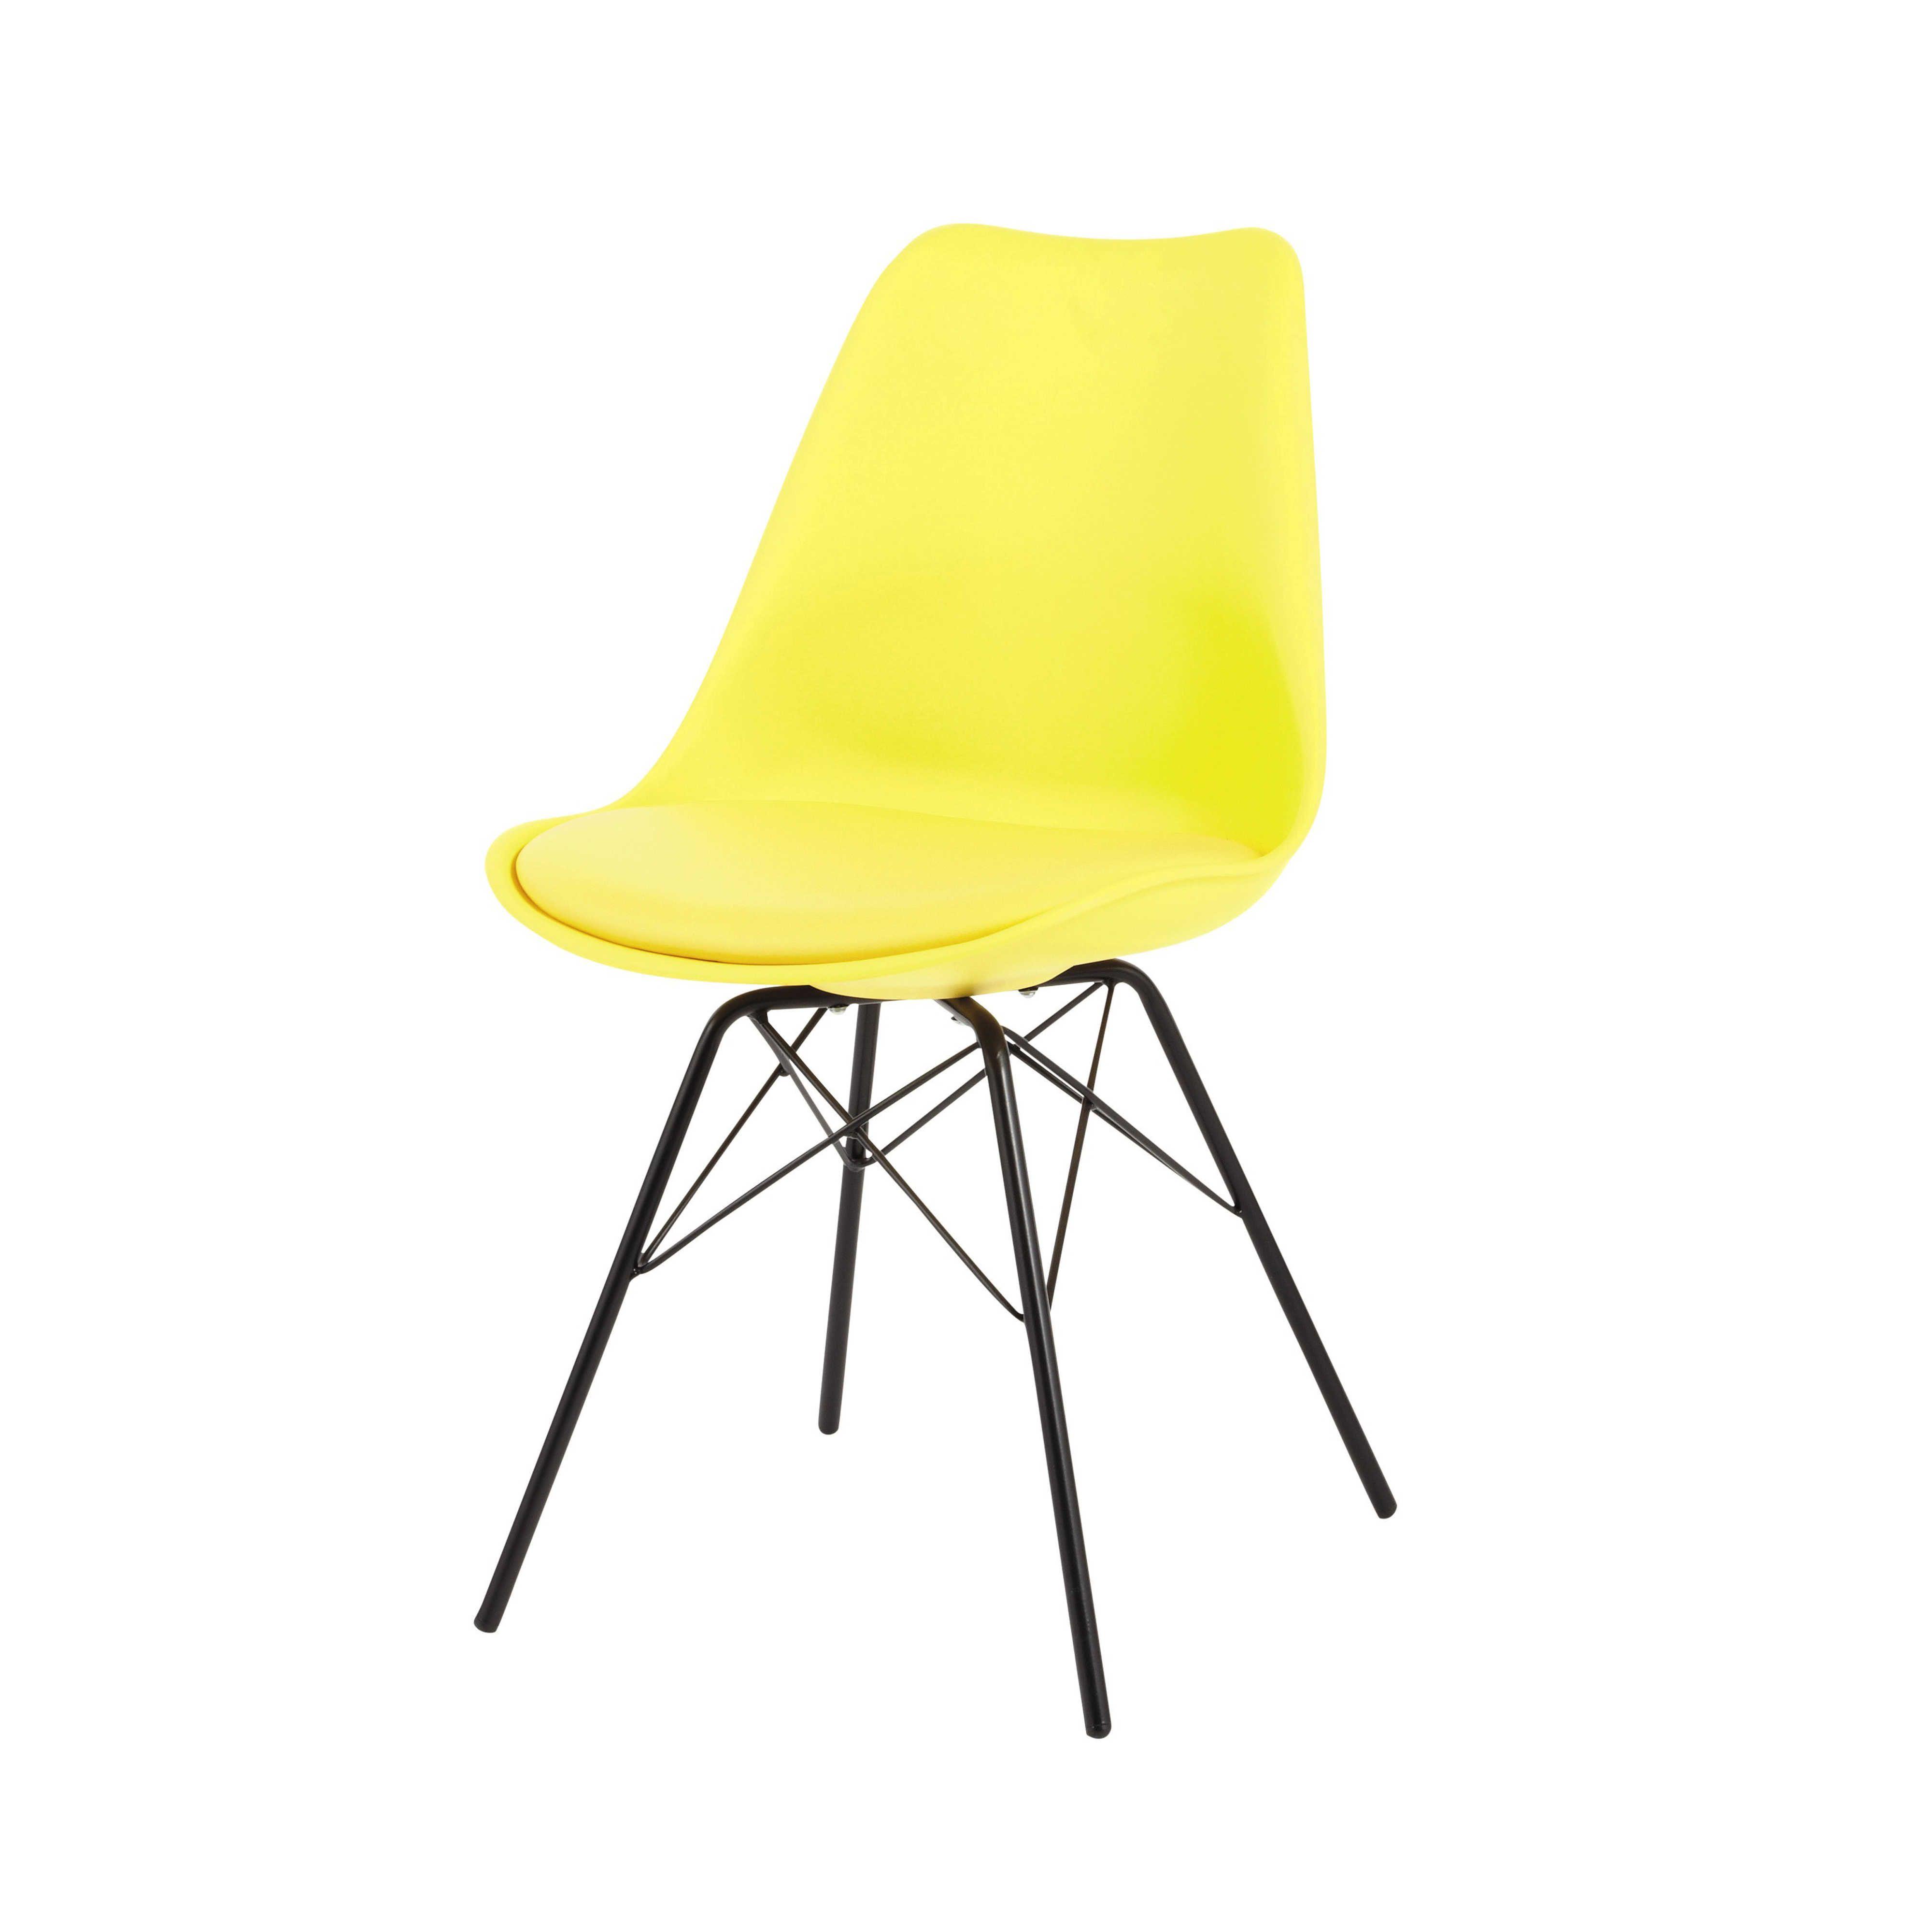 chaise coventry maison du monde. Black Bedroom Furniture Sets. Home Design Ideas